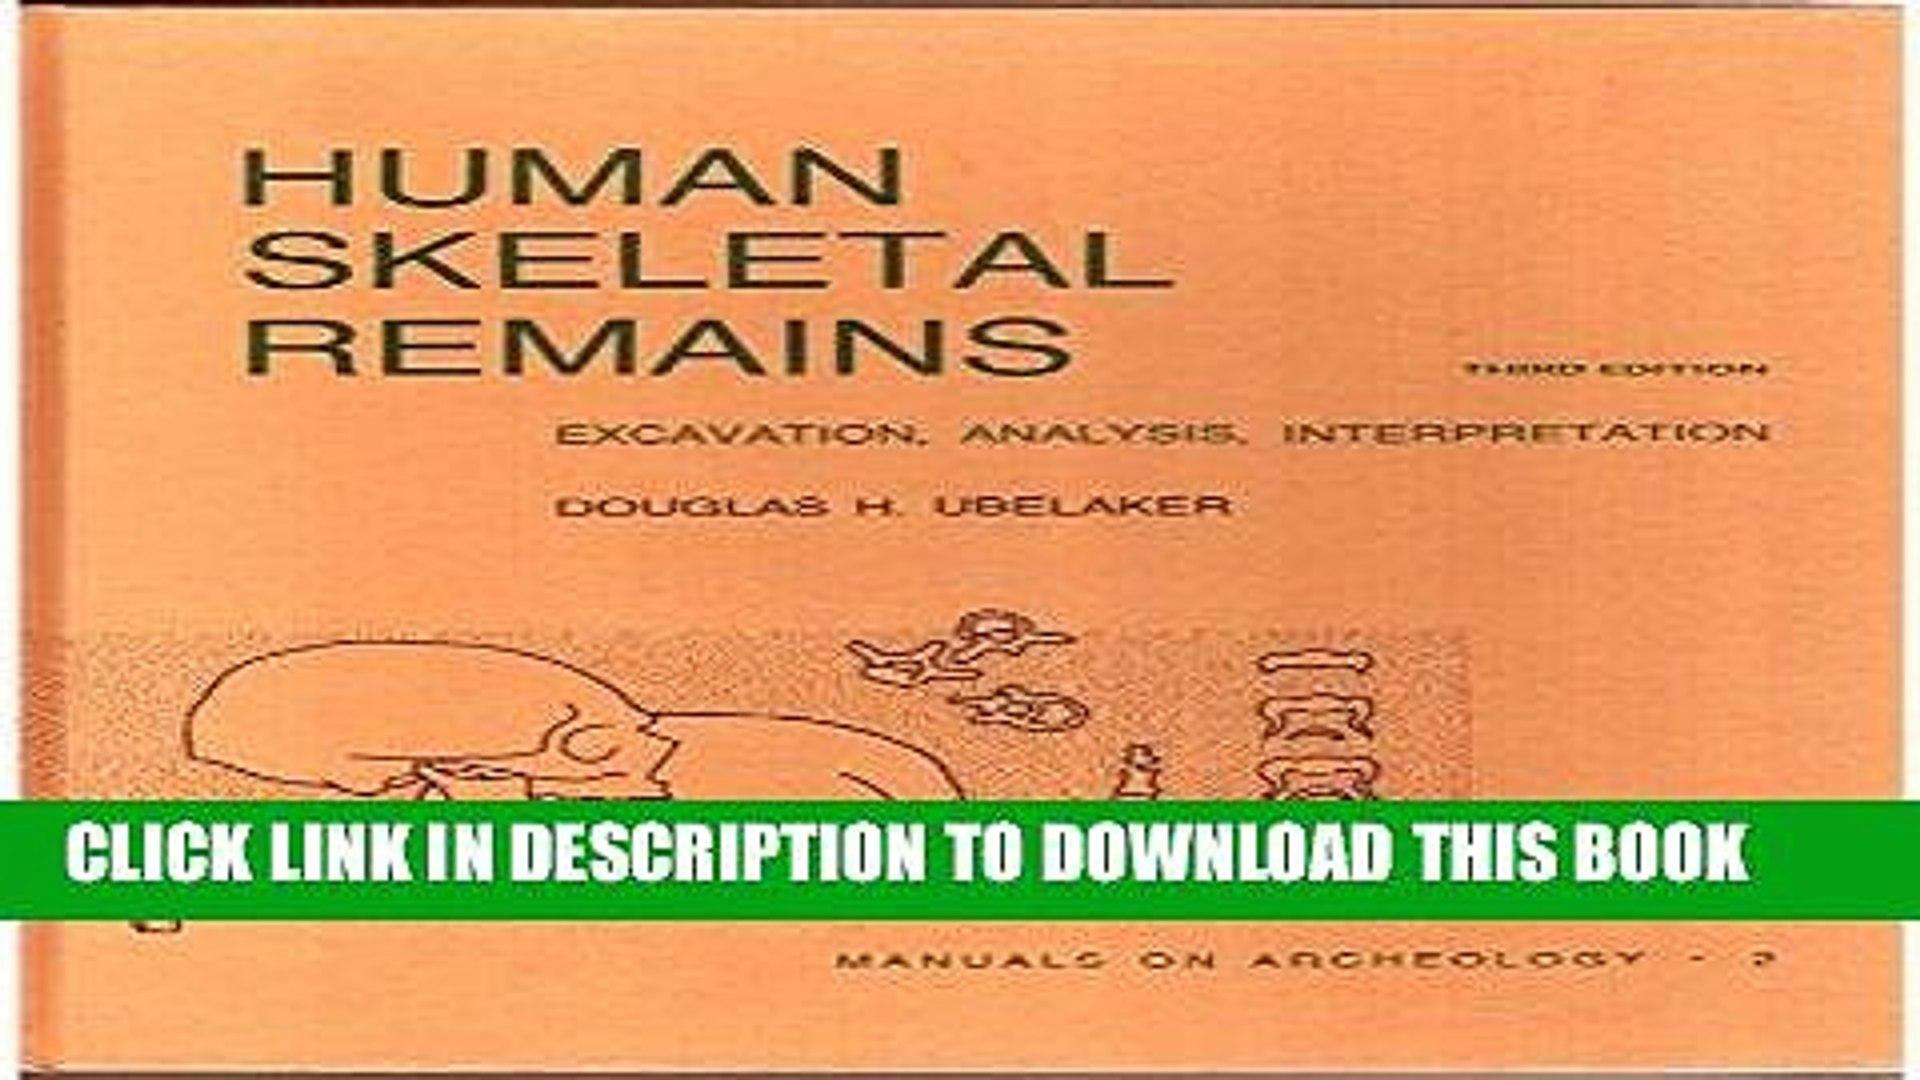 Interpretation Analysis Human Skeletal Remains Excavation